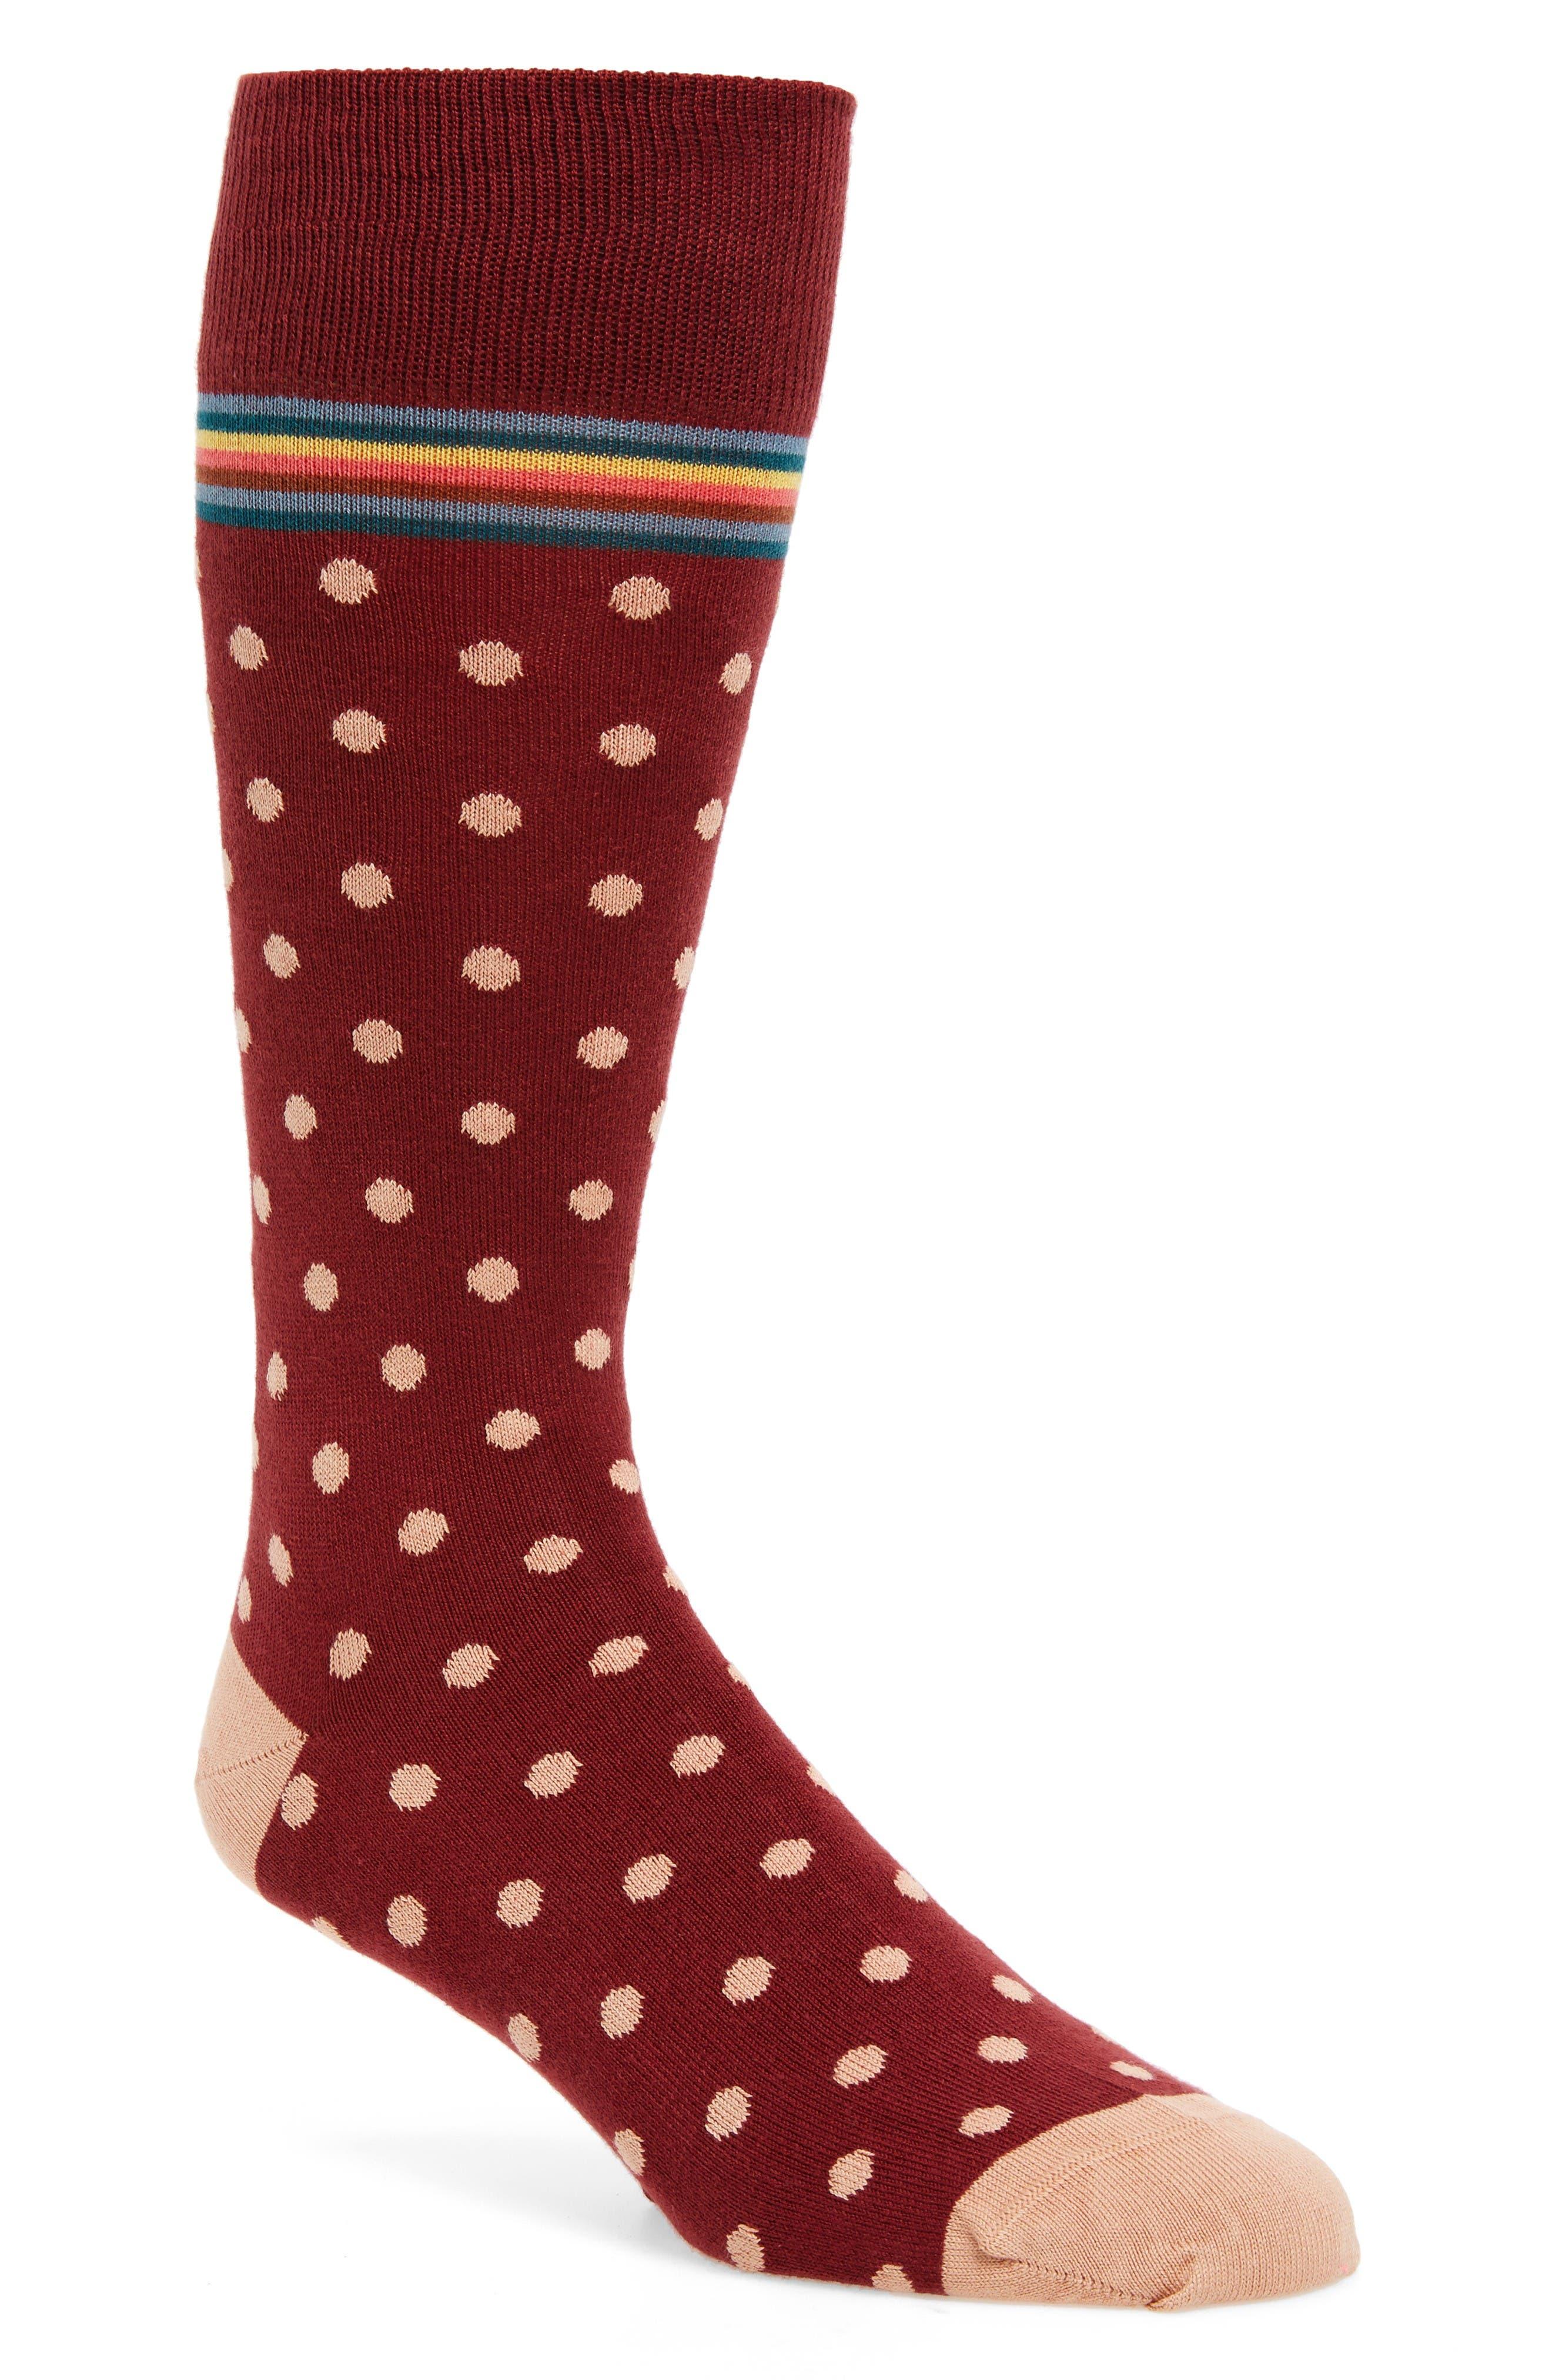 Alternate Image 1 Selected - Paul Smith Signature Polka Dot Socks